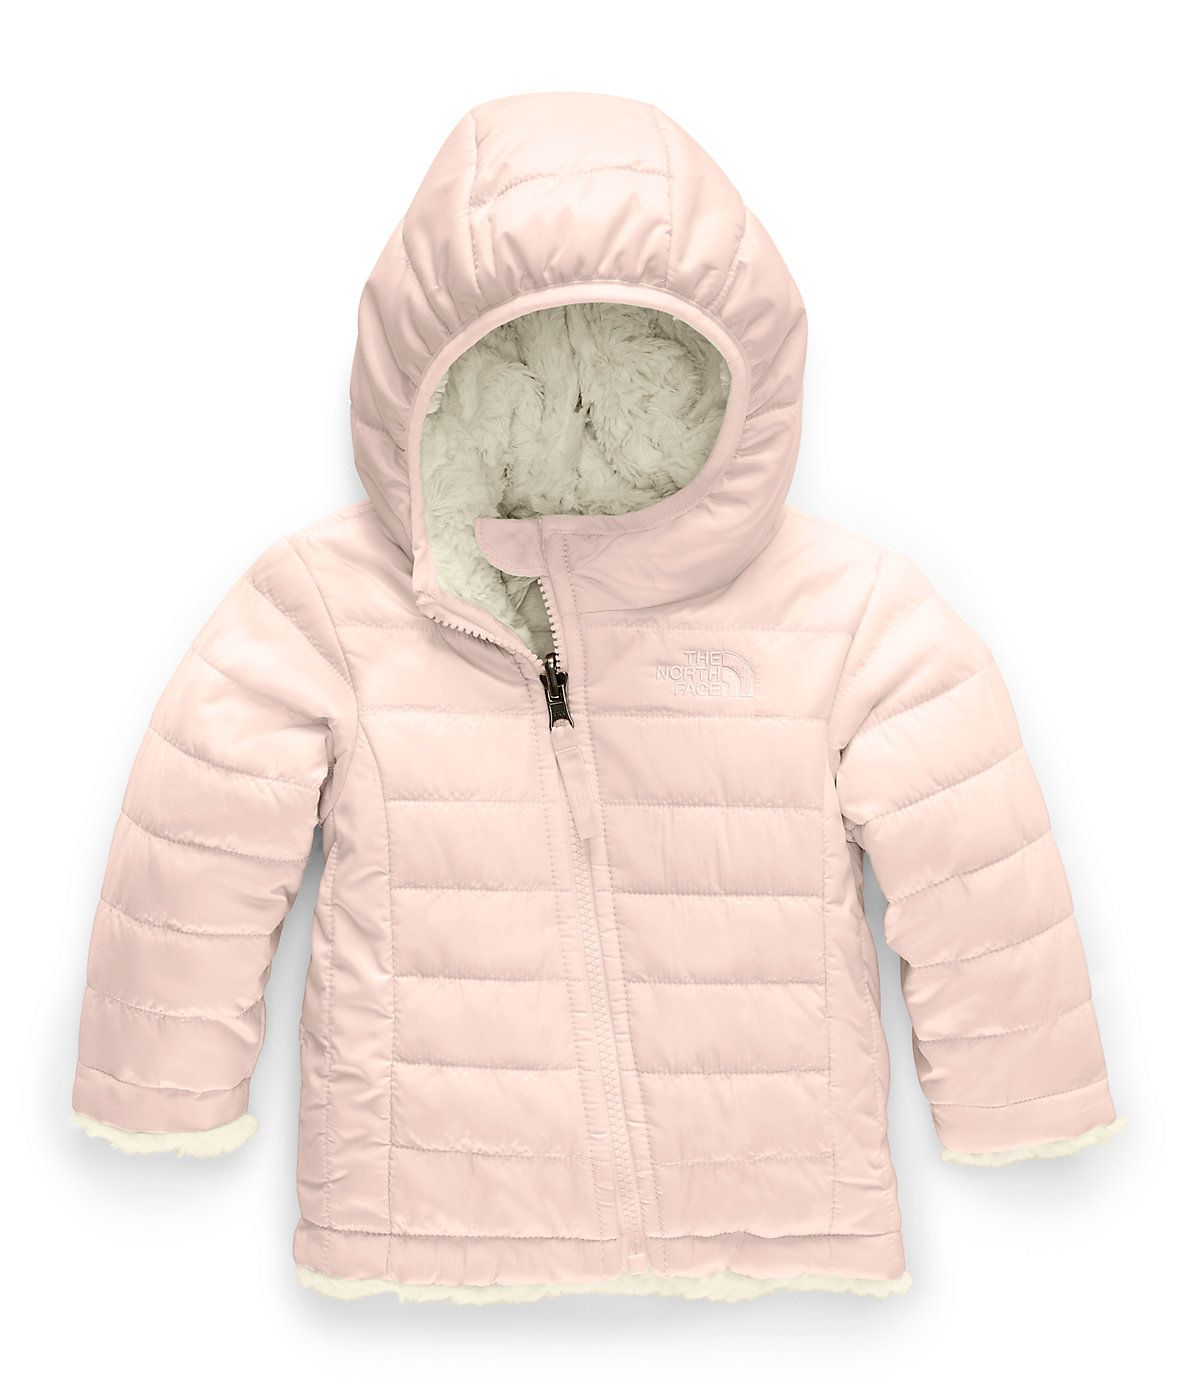 Infant Reversible Mossbud Swirl Hoodie The North Face In 2021 North Face Kids North Face Mossbud Baby Girl Jackets [ 1396 x 1200 Pixel ]